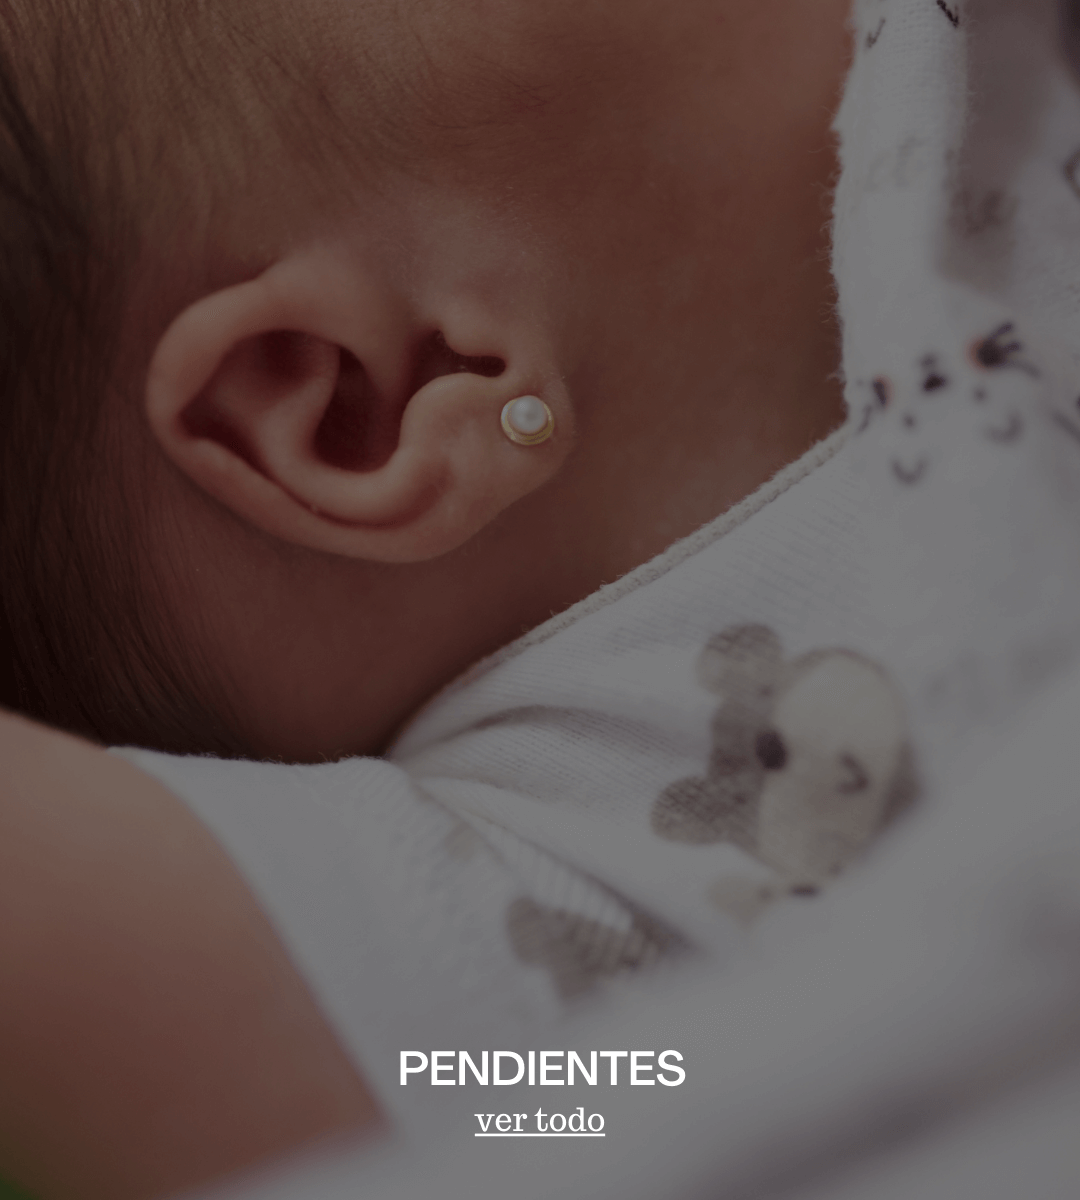 pendientes-bebe-general